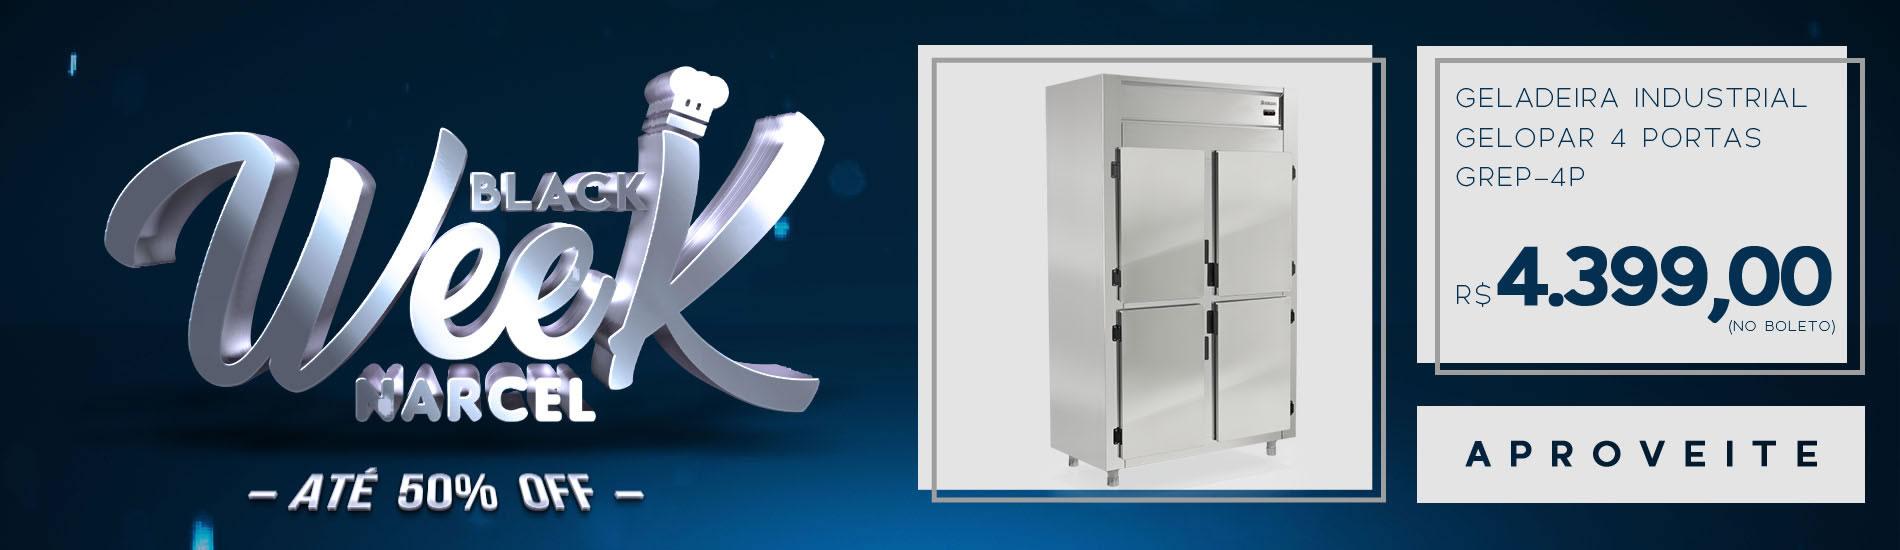 blackweek geladeira grep-4p